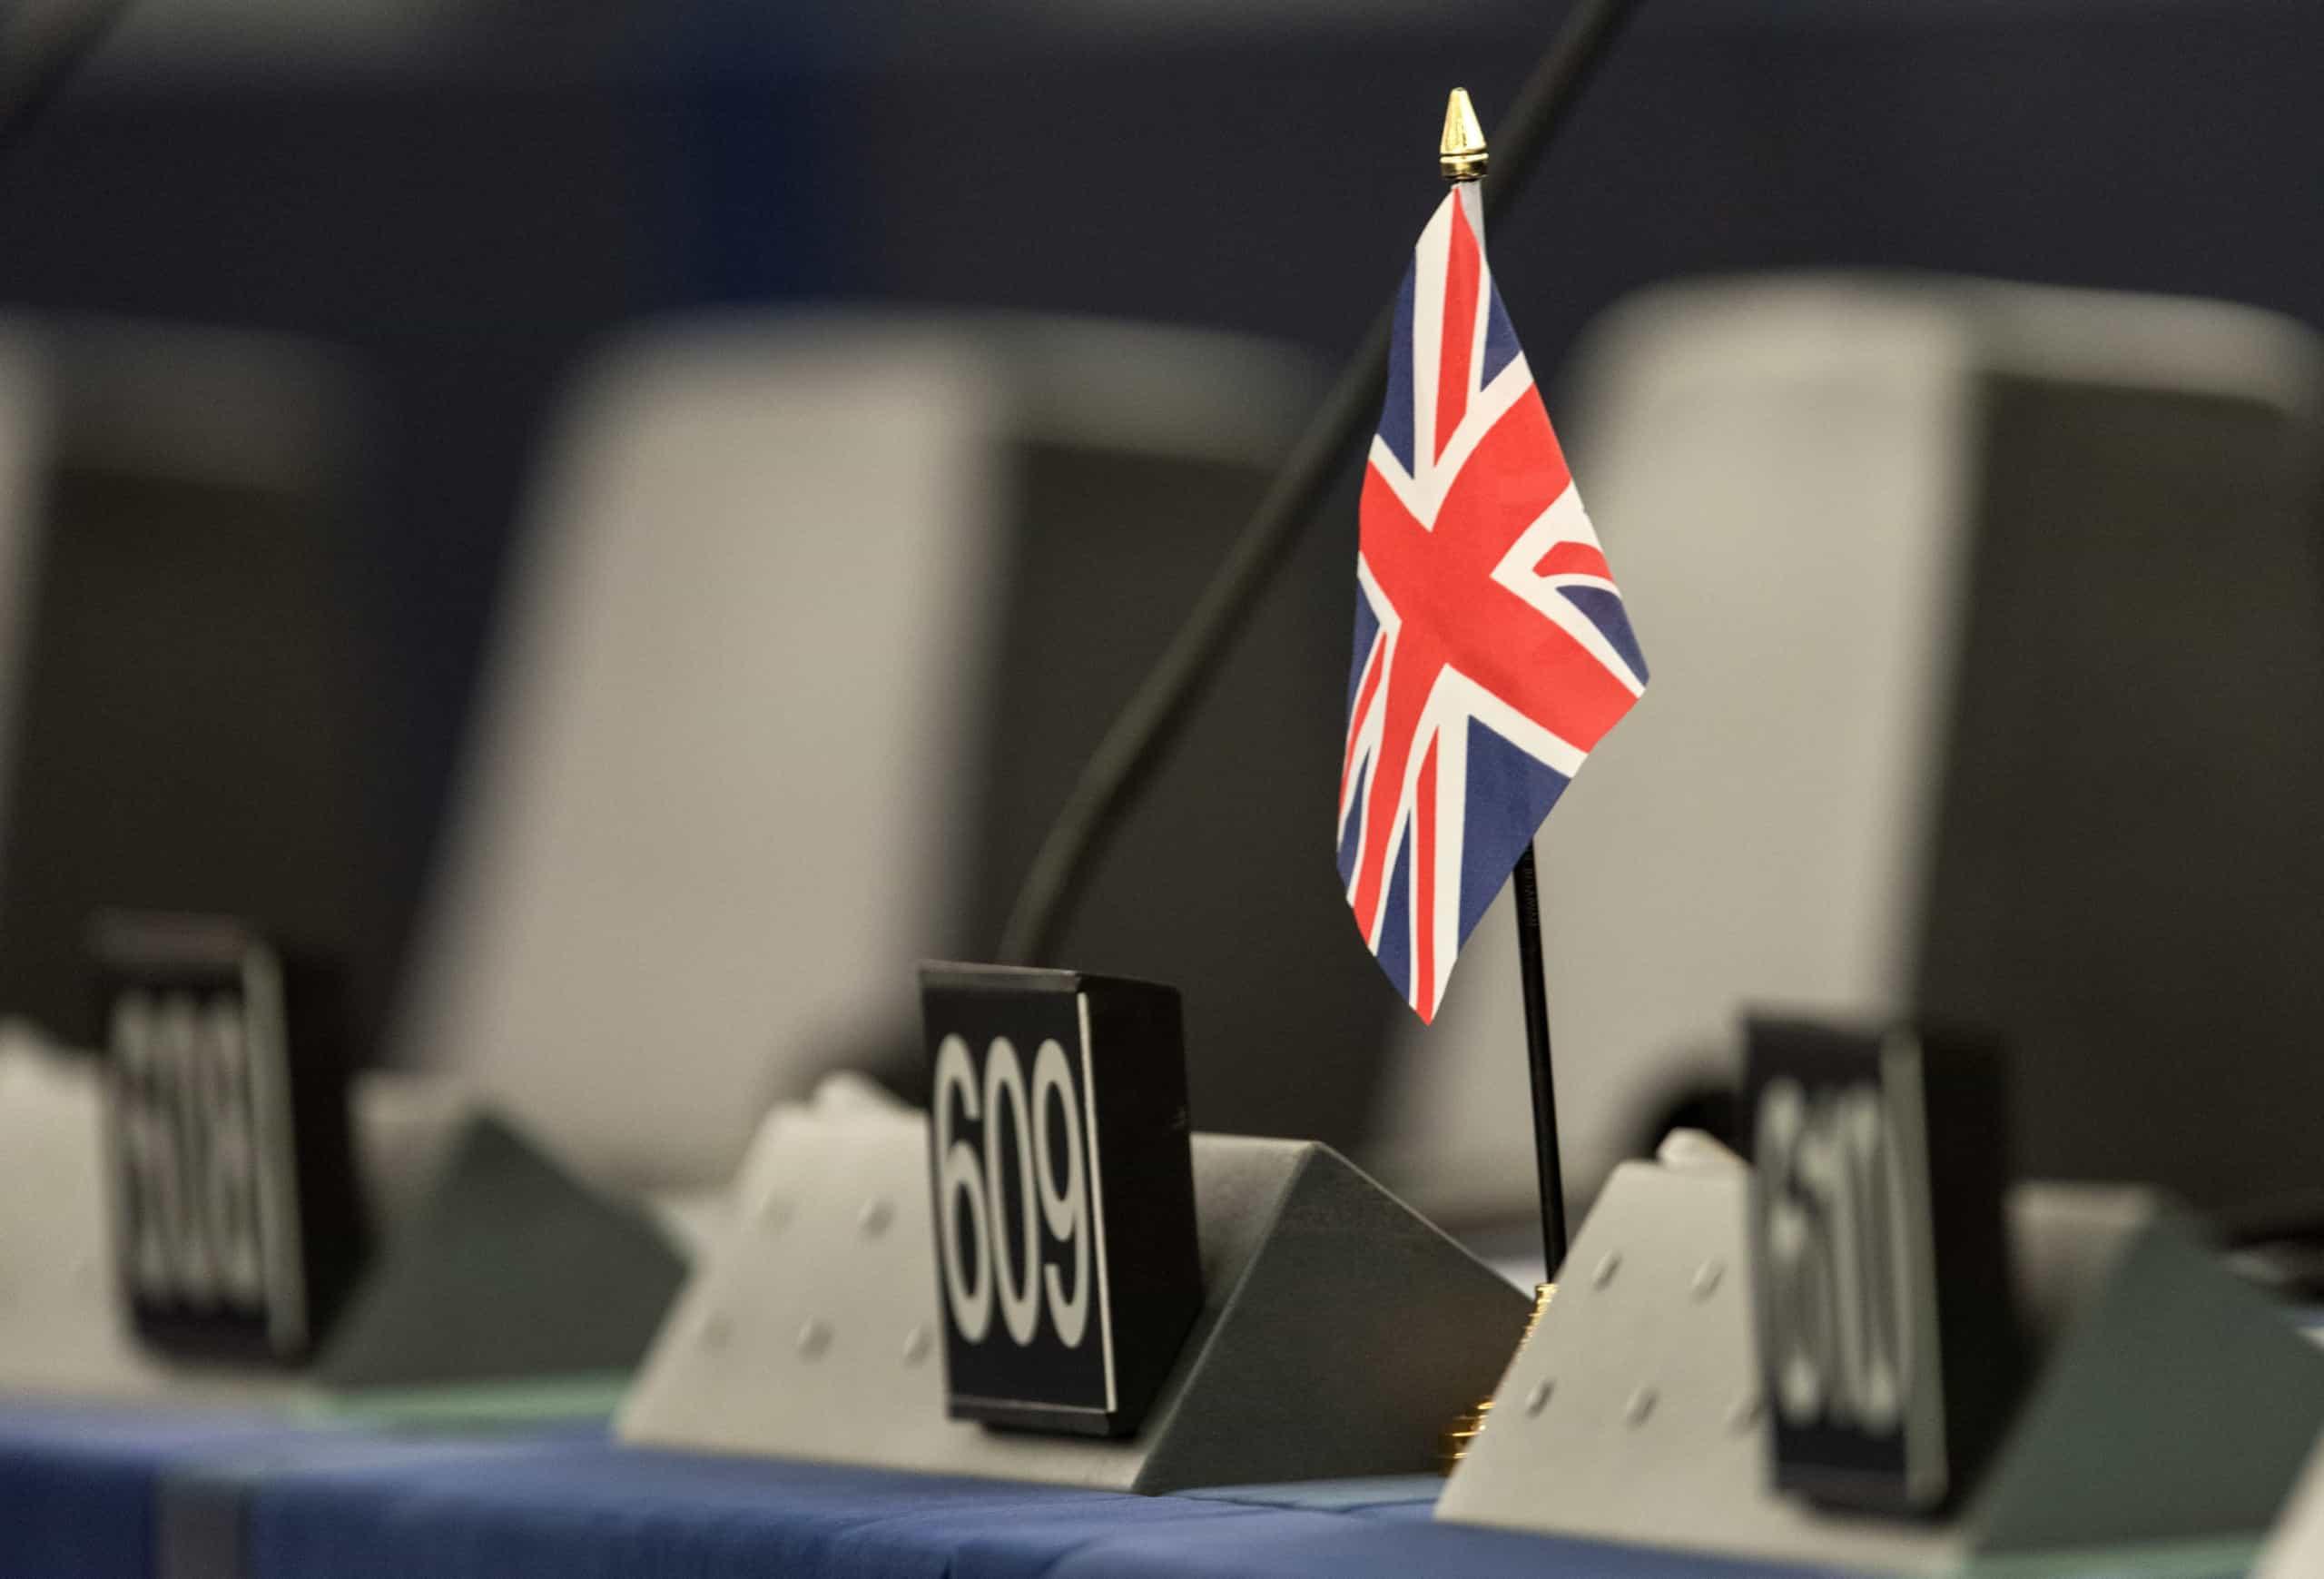 Parlamento Europeu vota medidas urgentes perante incerteza do Brexit